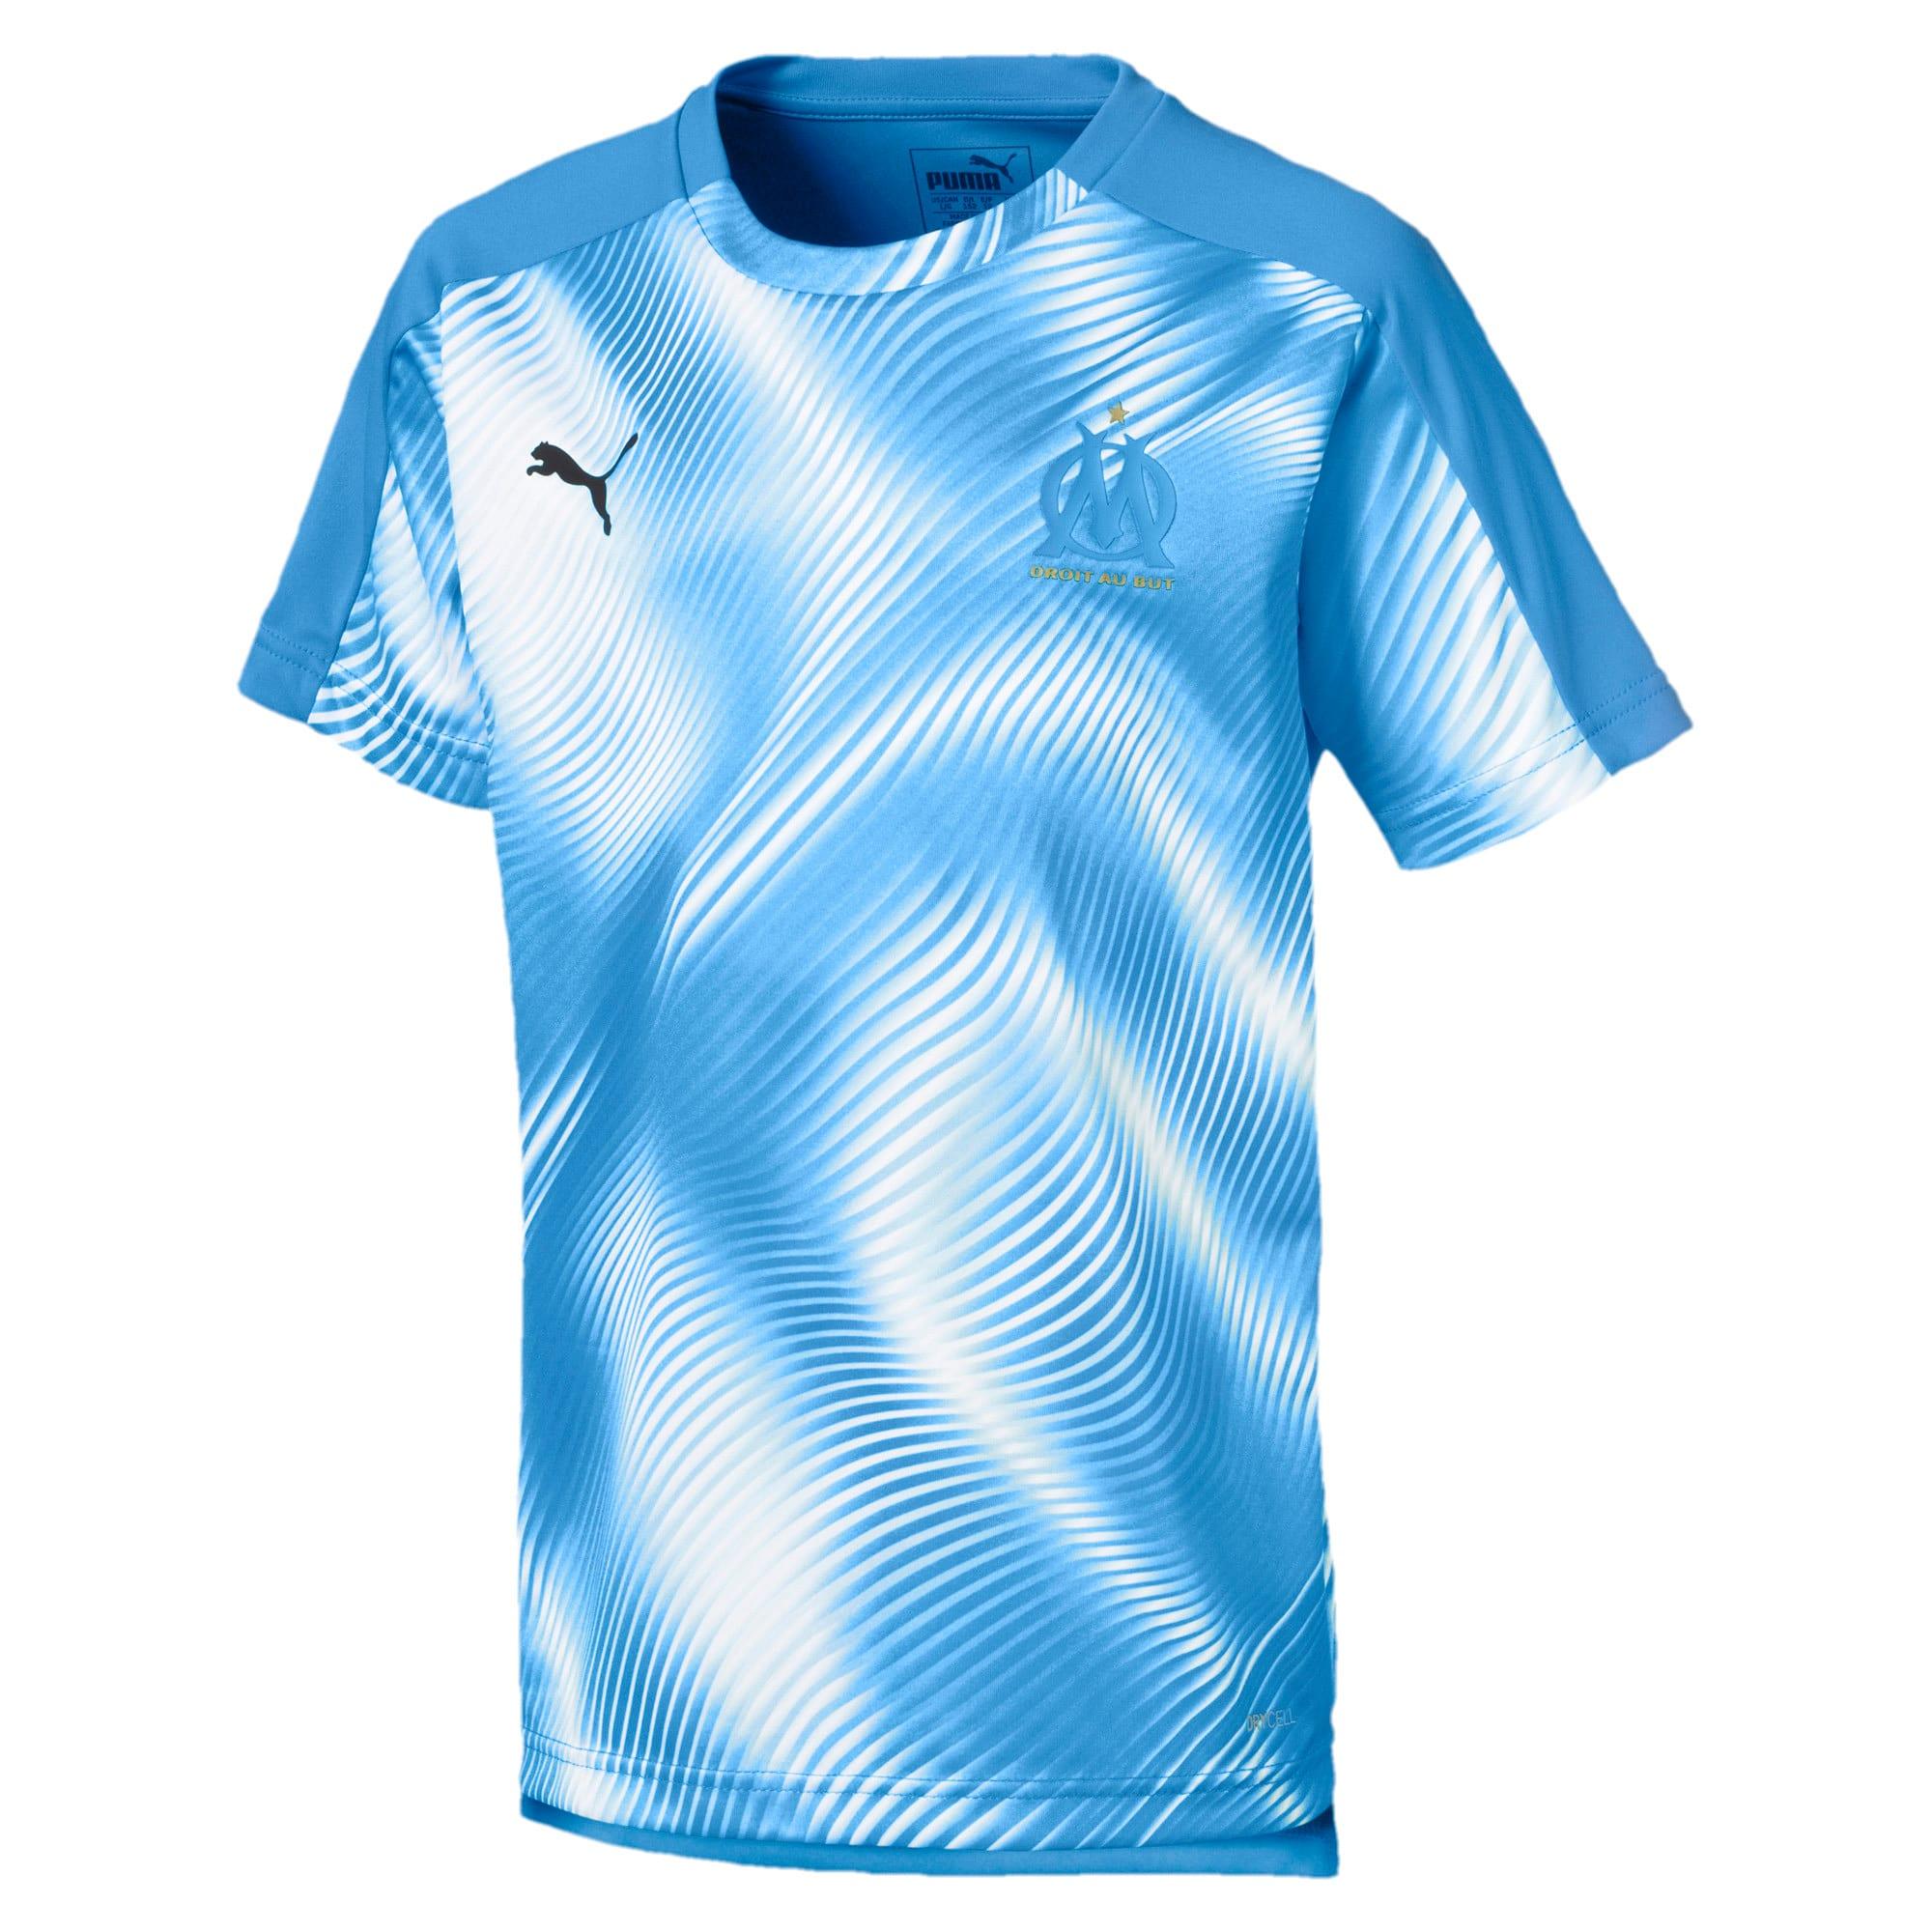 Thumbnail 1 of Olympique de Marseille Stadium Boys' Jersey, Bleu Azur-Puma White, medium